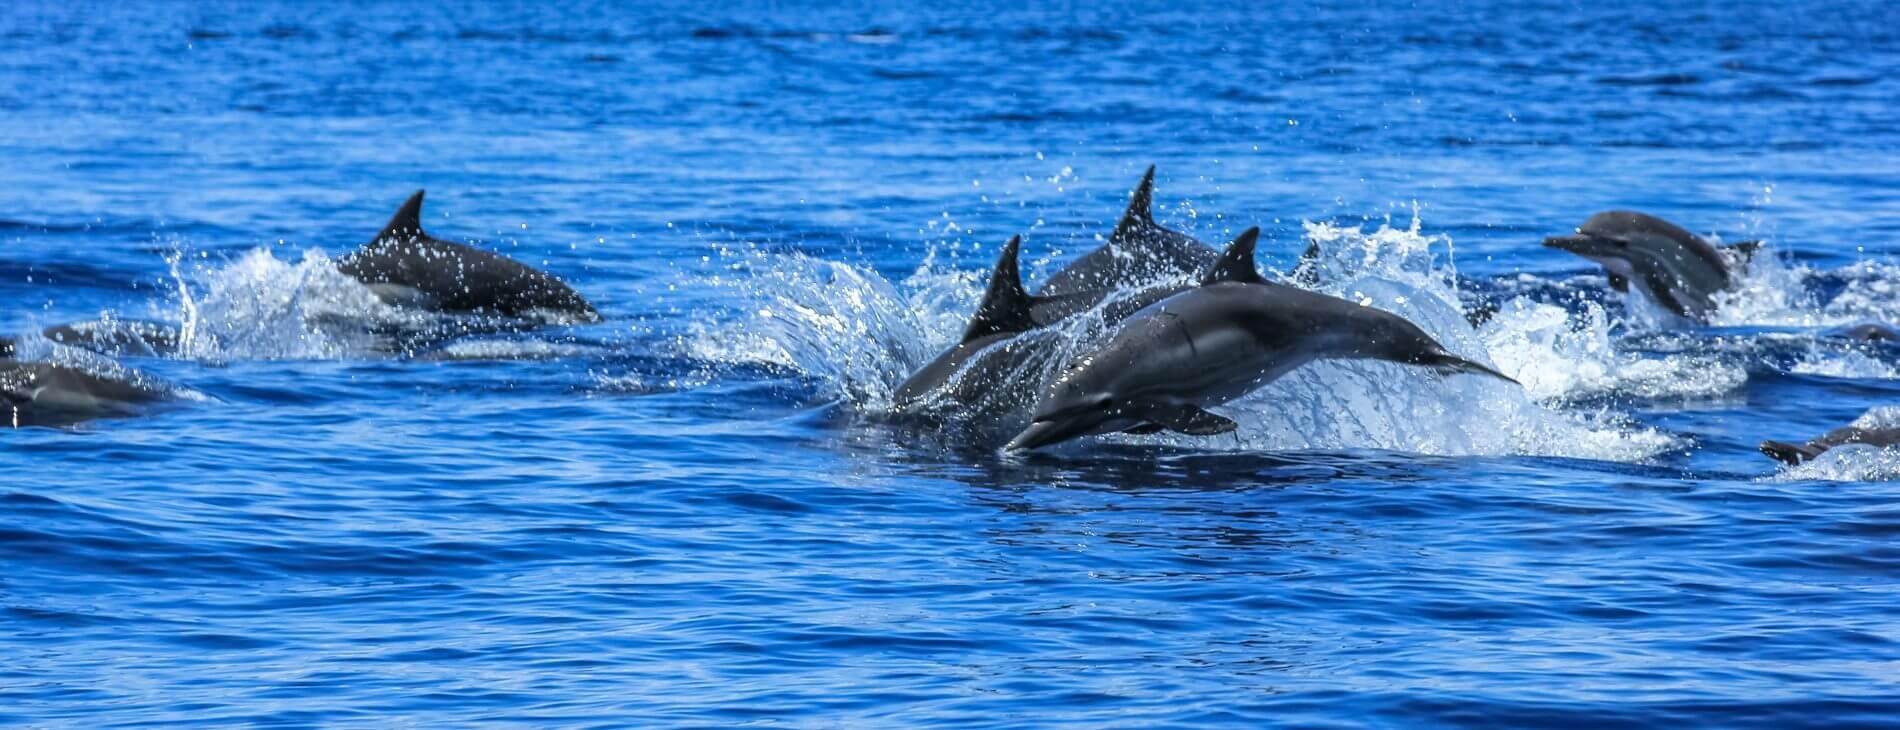 Mastroviaggiatore Baja California Eco camp dolphins